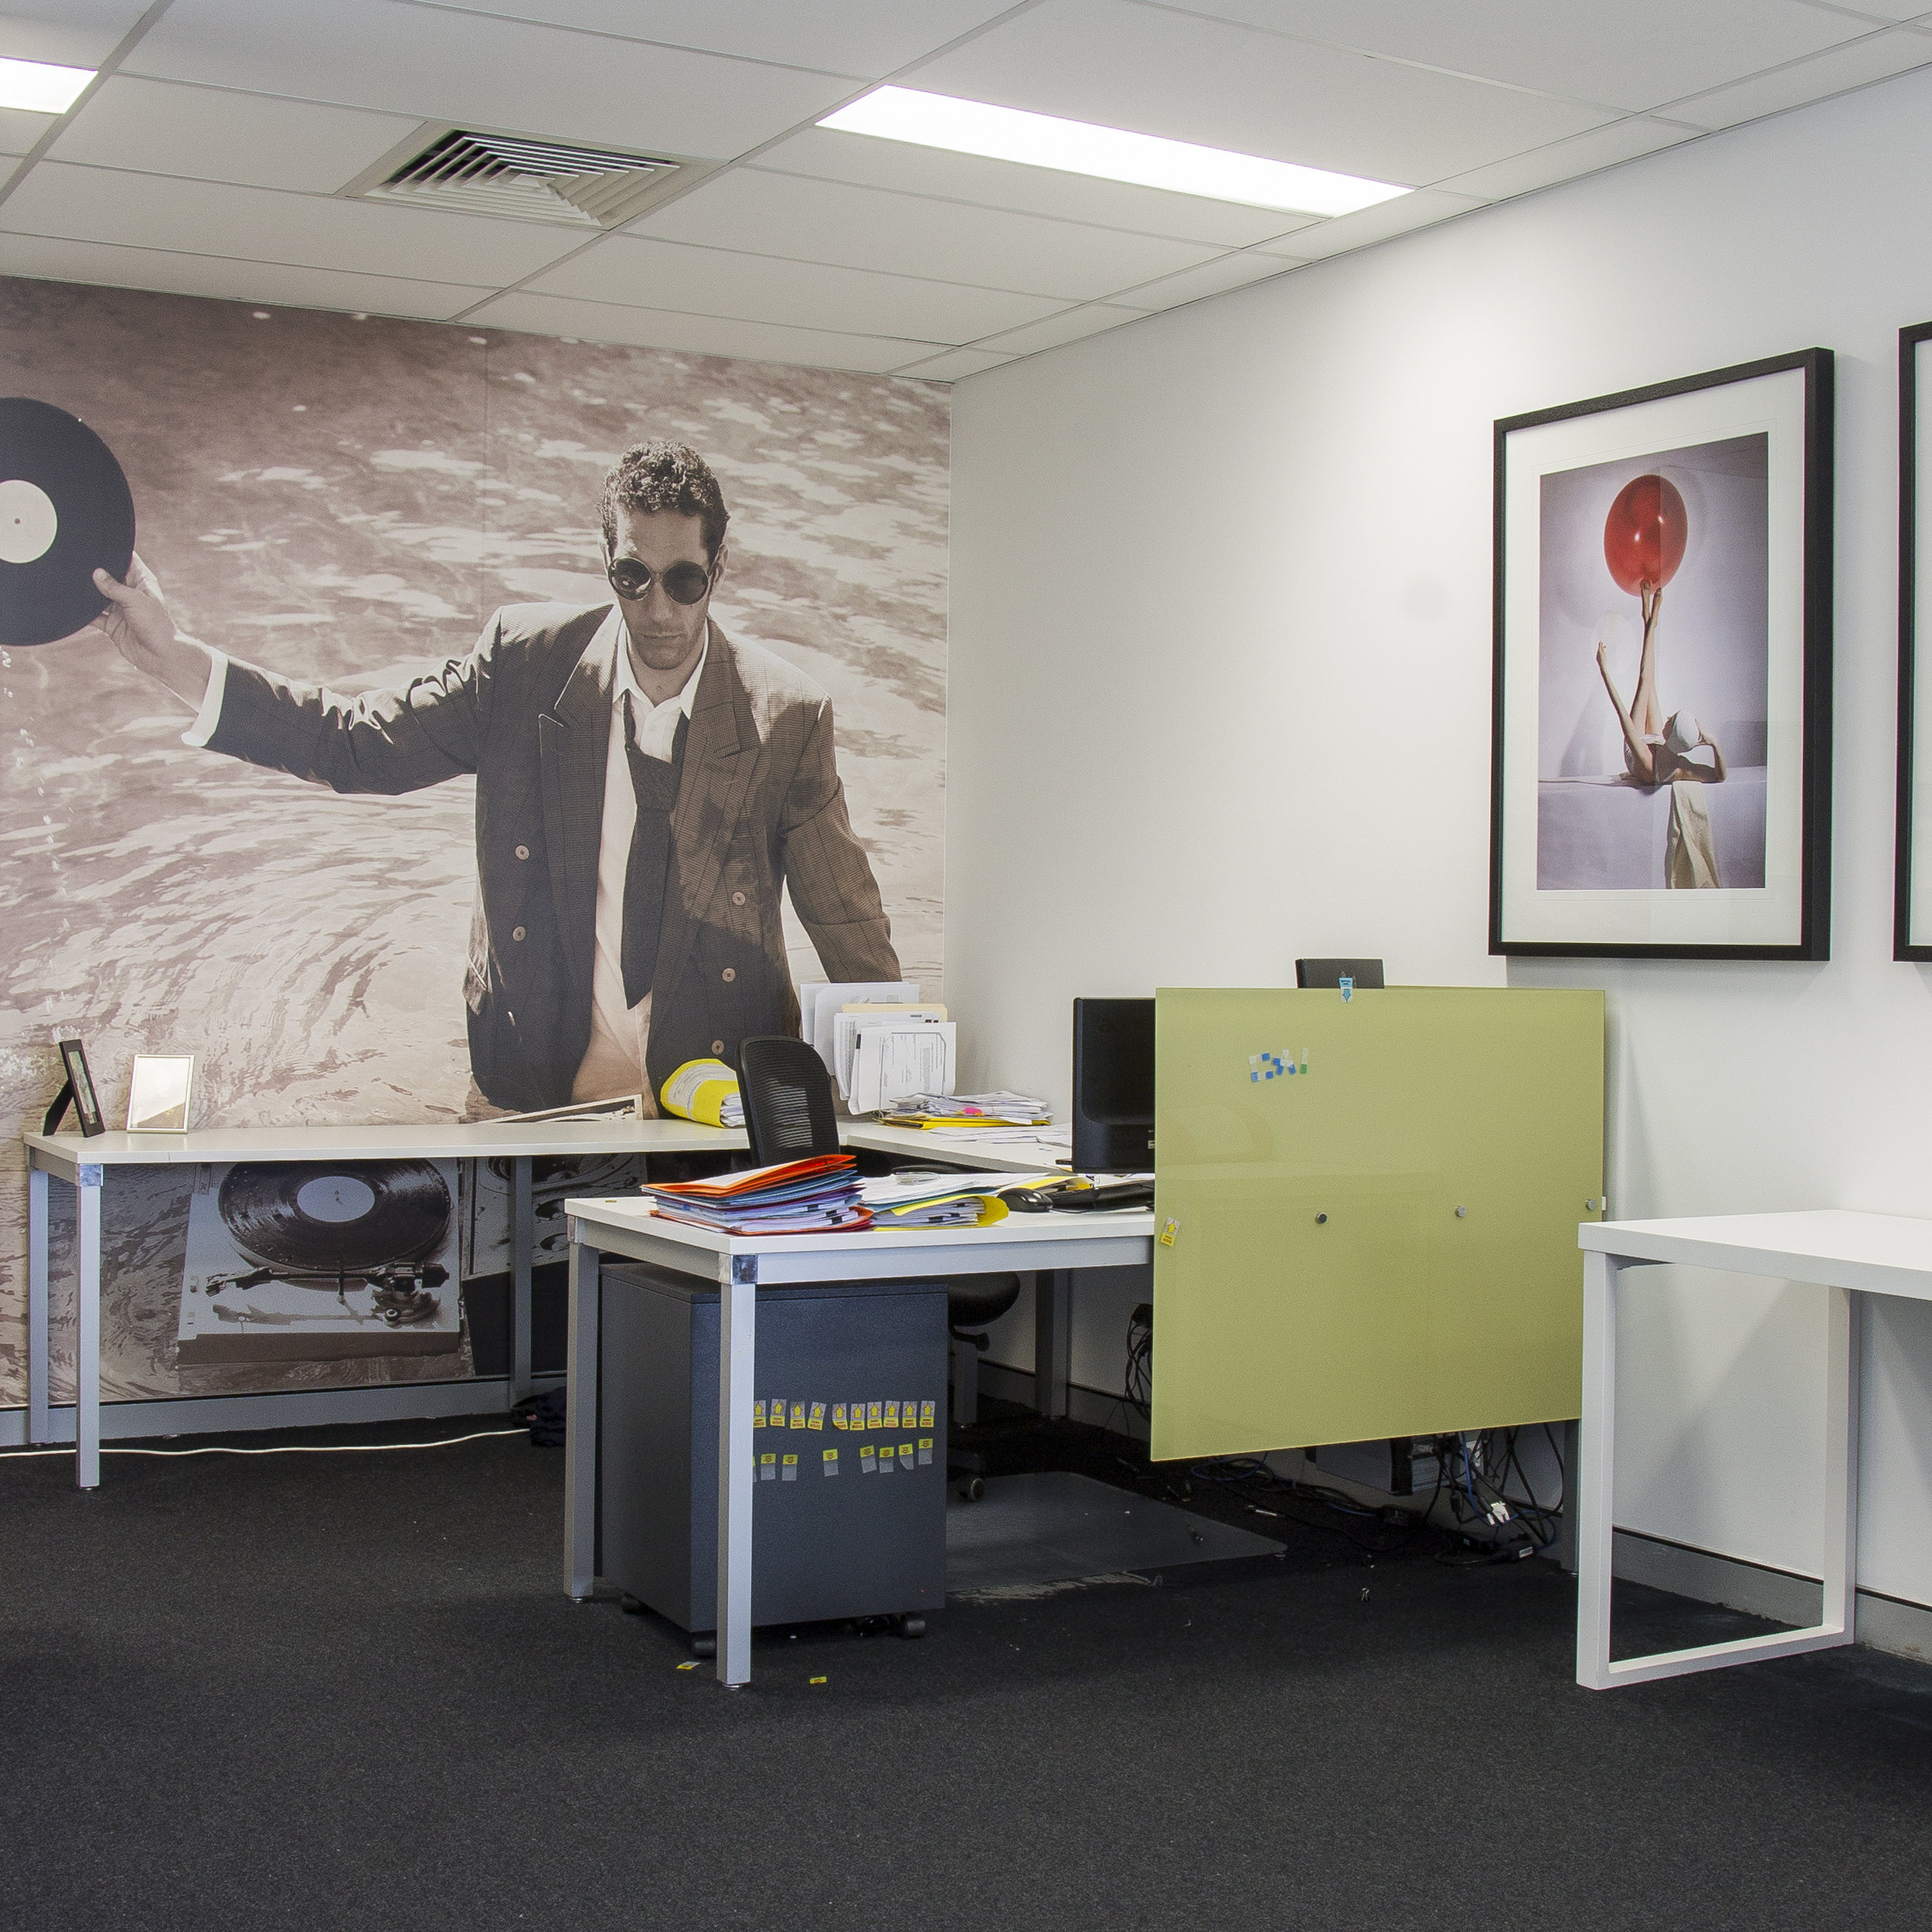 Design Scout - Interior Design - Jacinta Platt - Gold Coast Interior Designer - Photography by Tanika Blair - IMG_7041.jpg